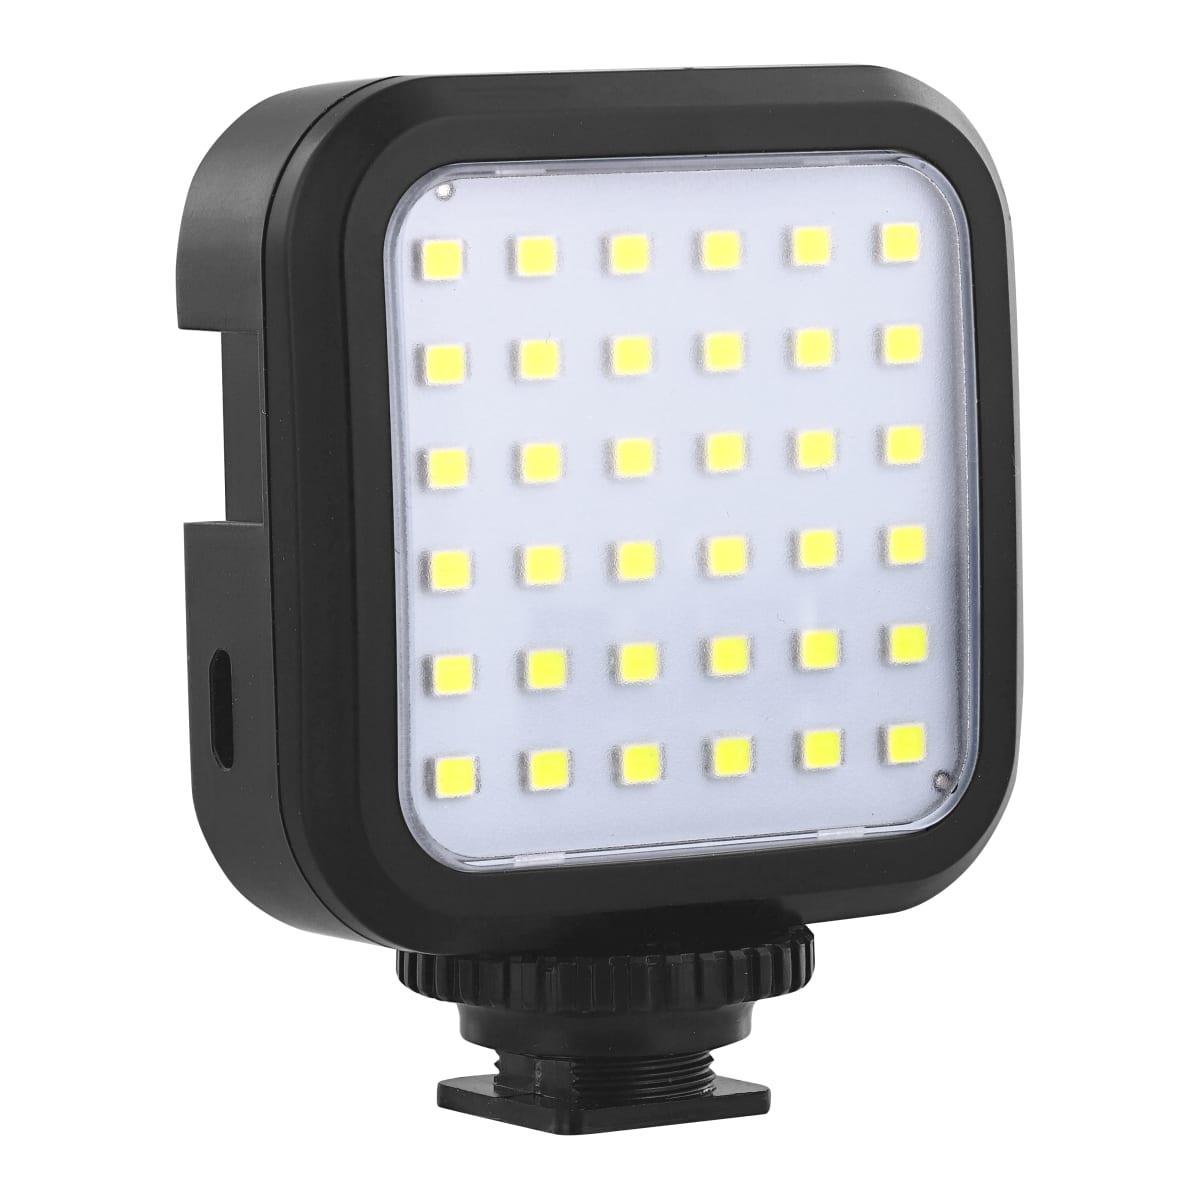 Mini LED projector for camera